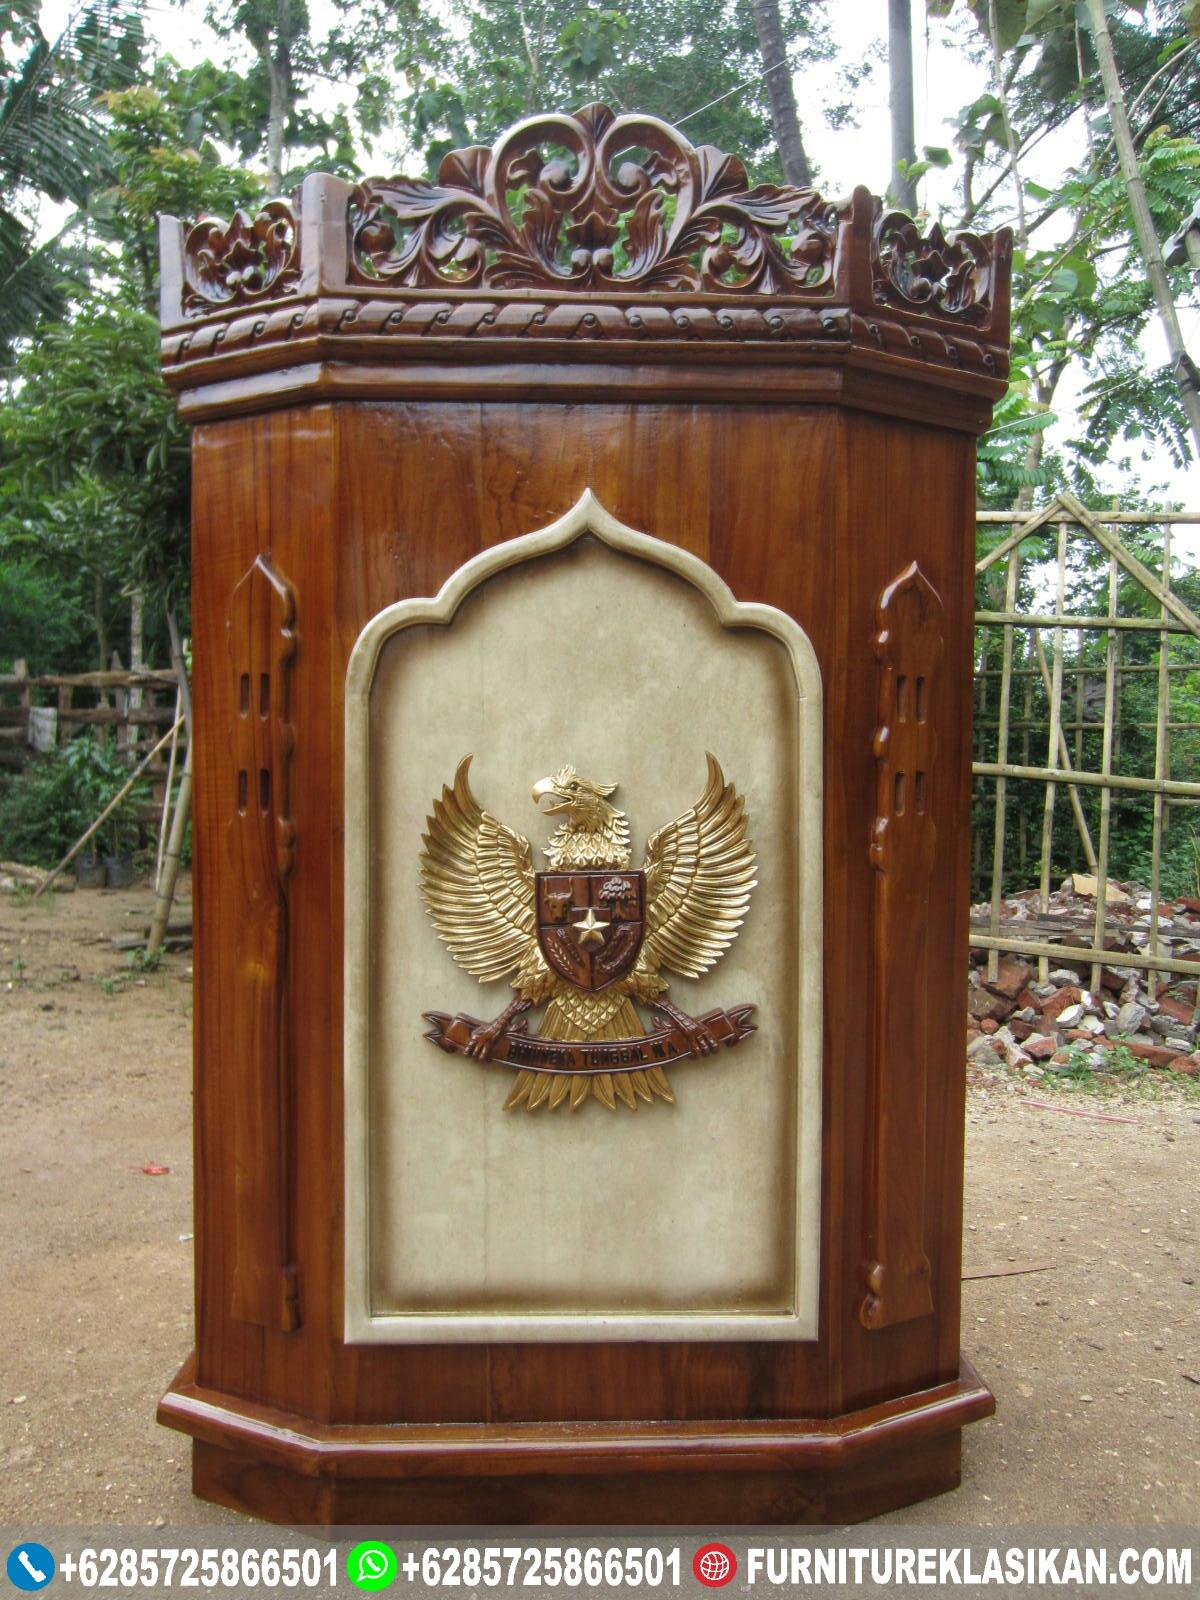 Mimbar-Podium-Jati-Mushola Podium Mimbar Jati Garuda